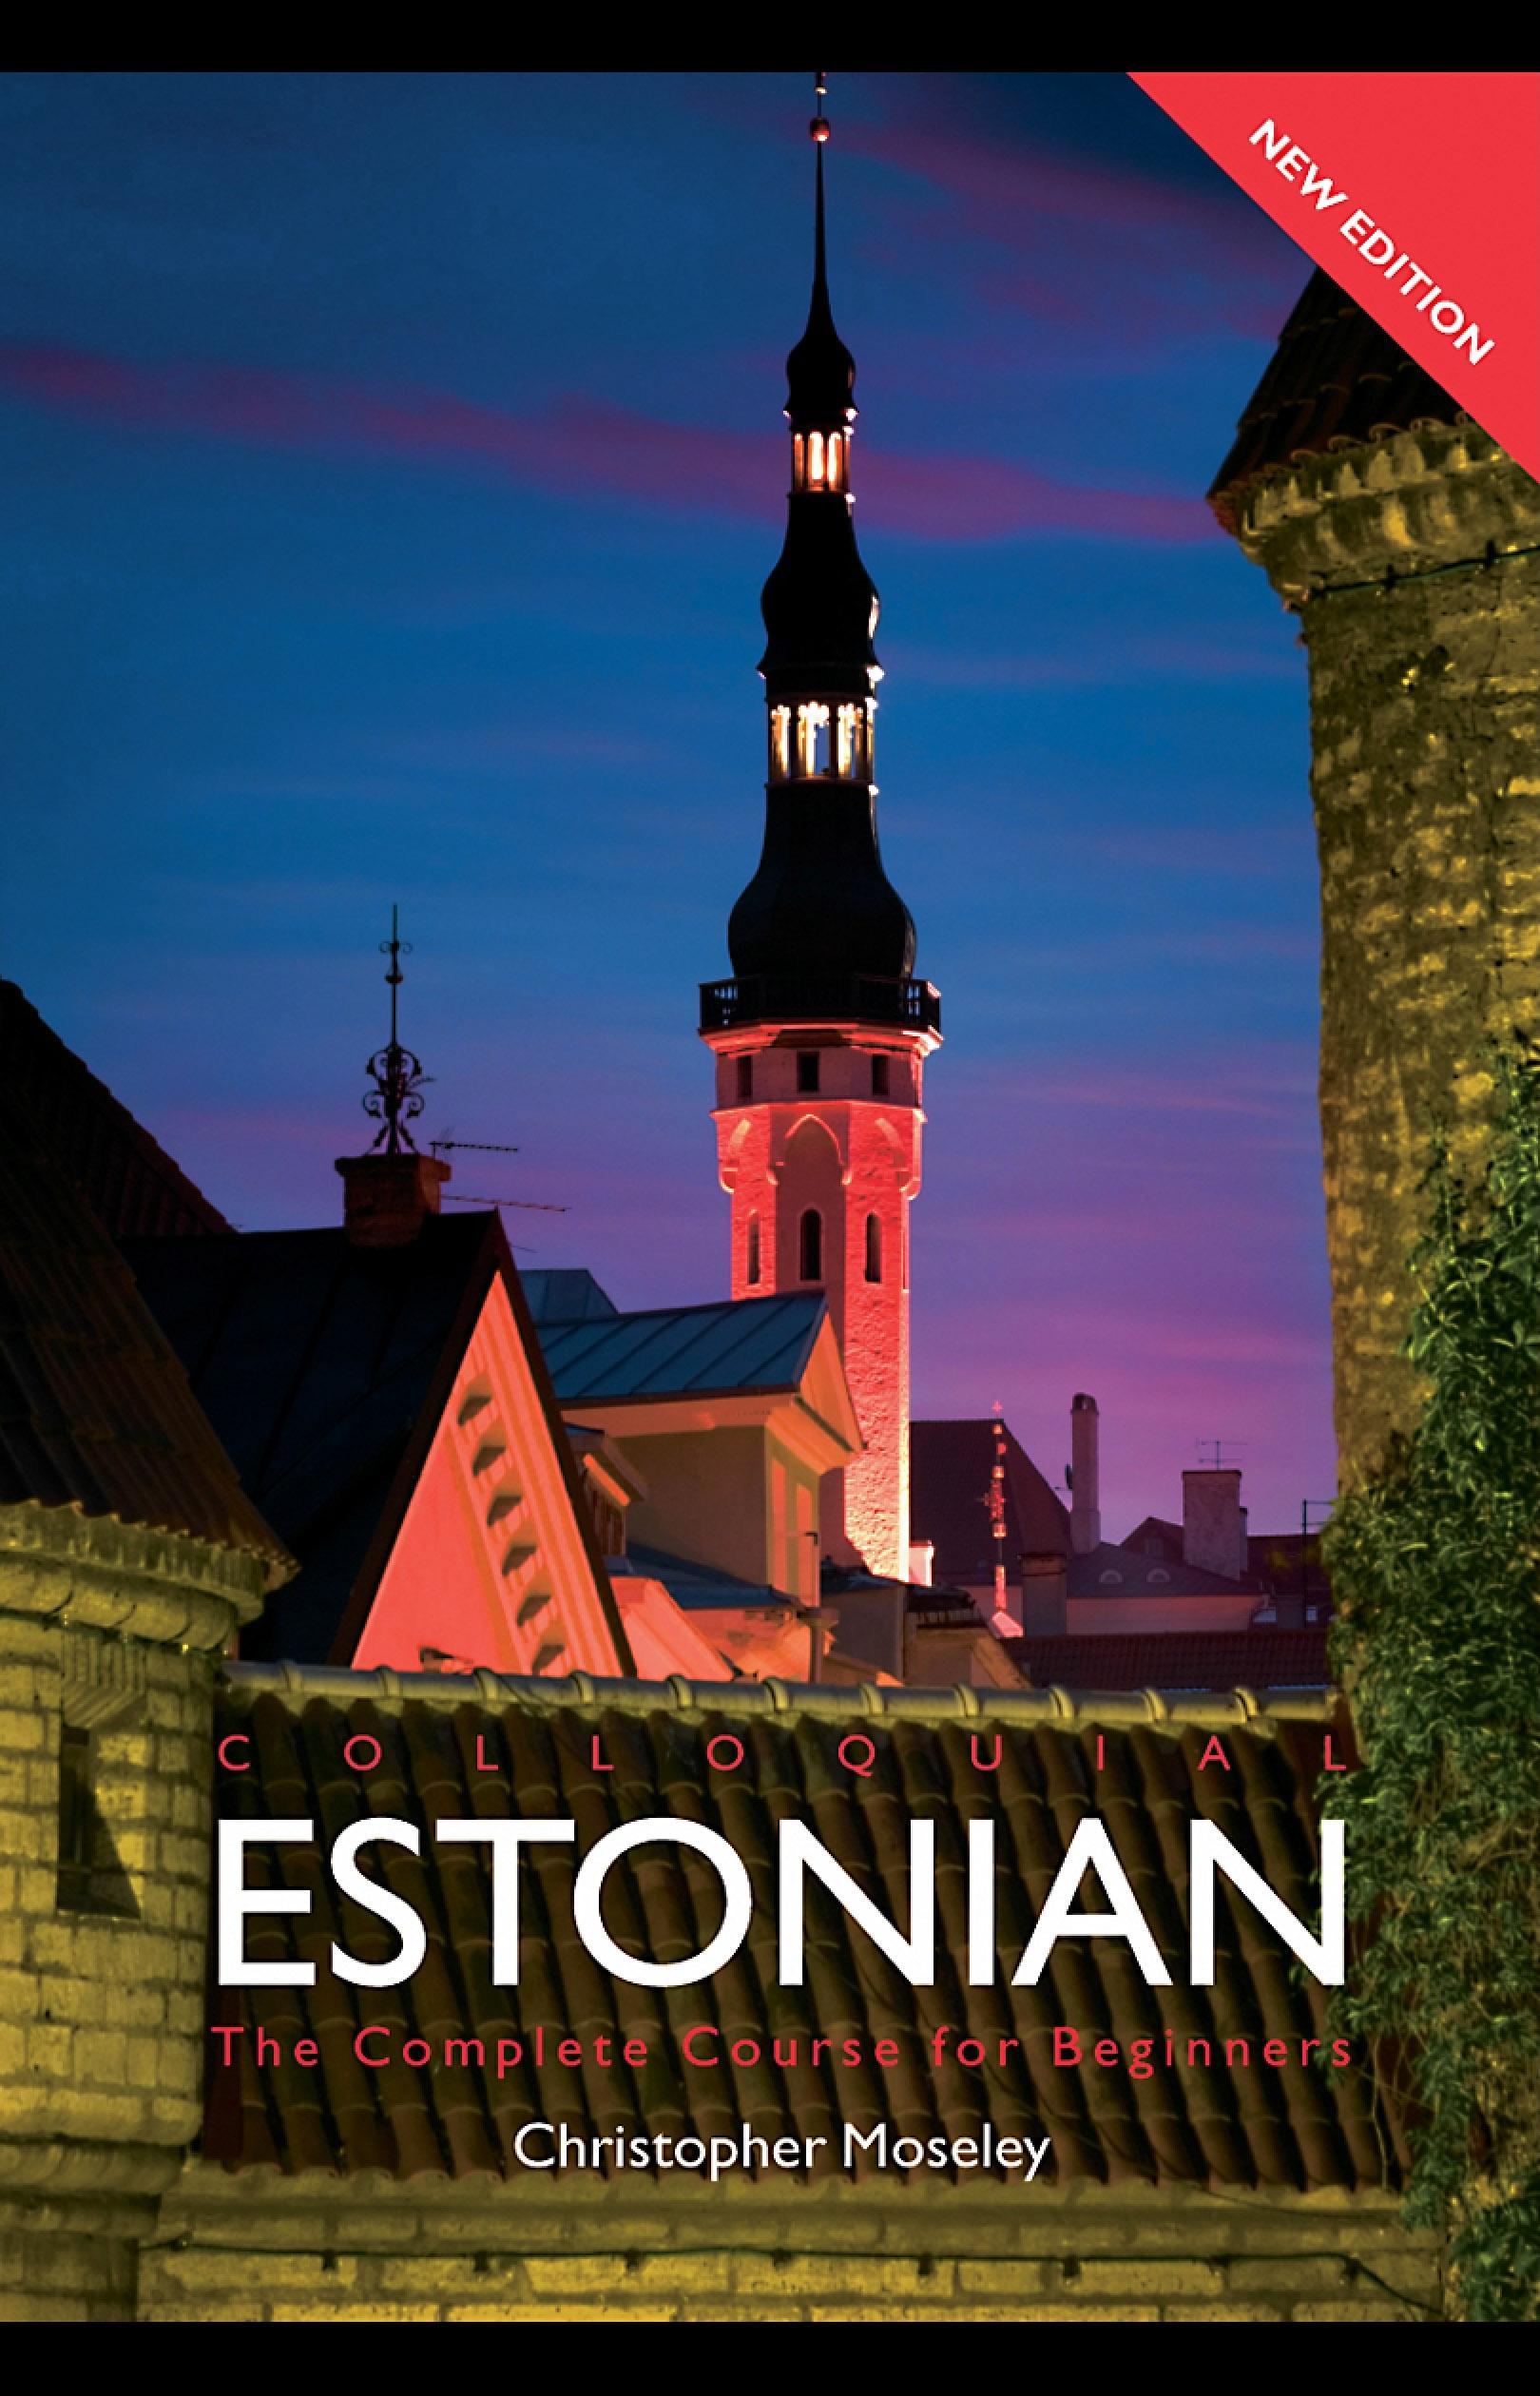 Colloquial Estonian EB9780203019696